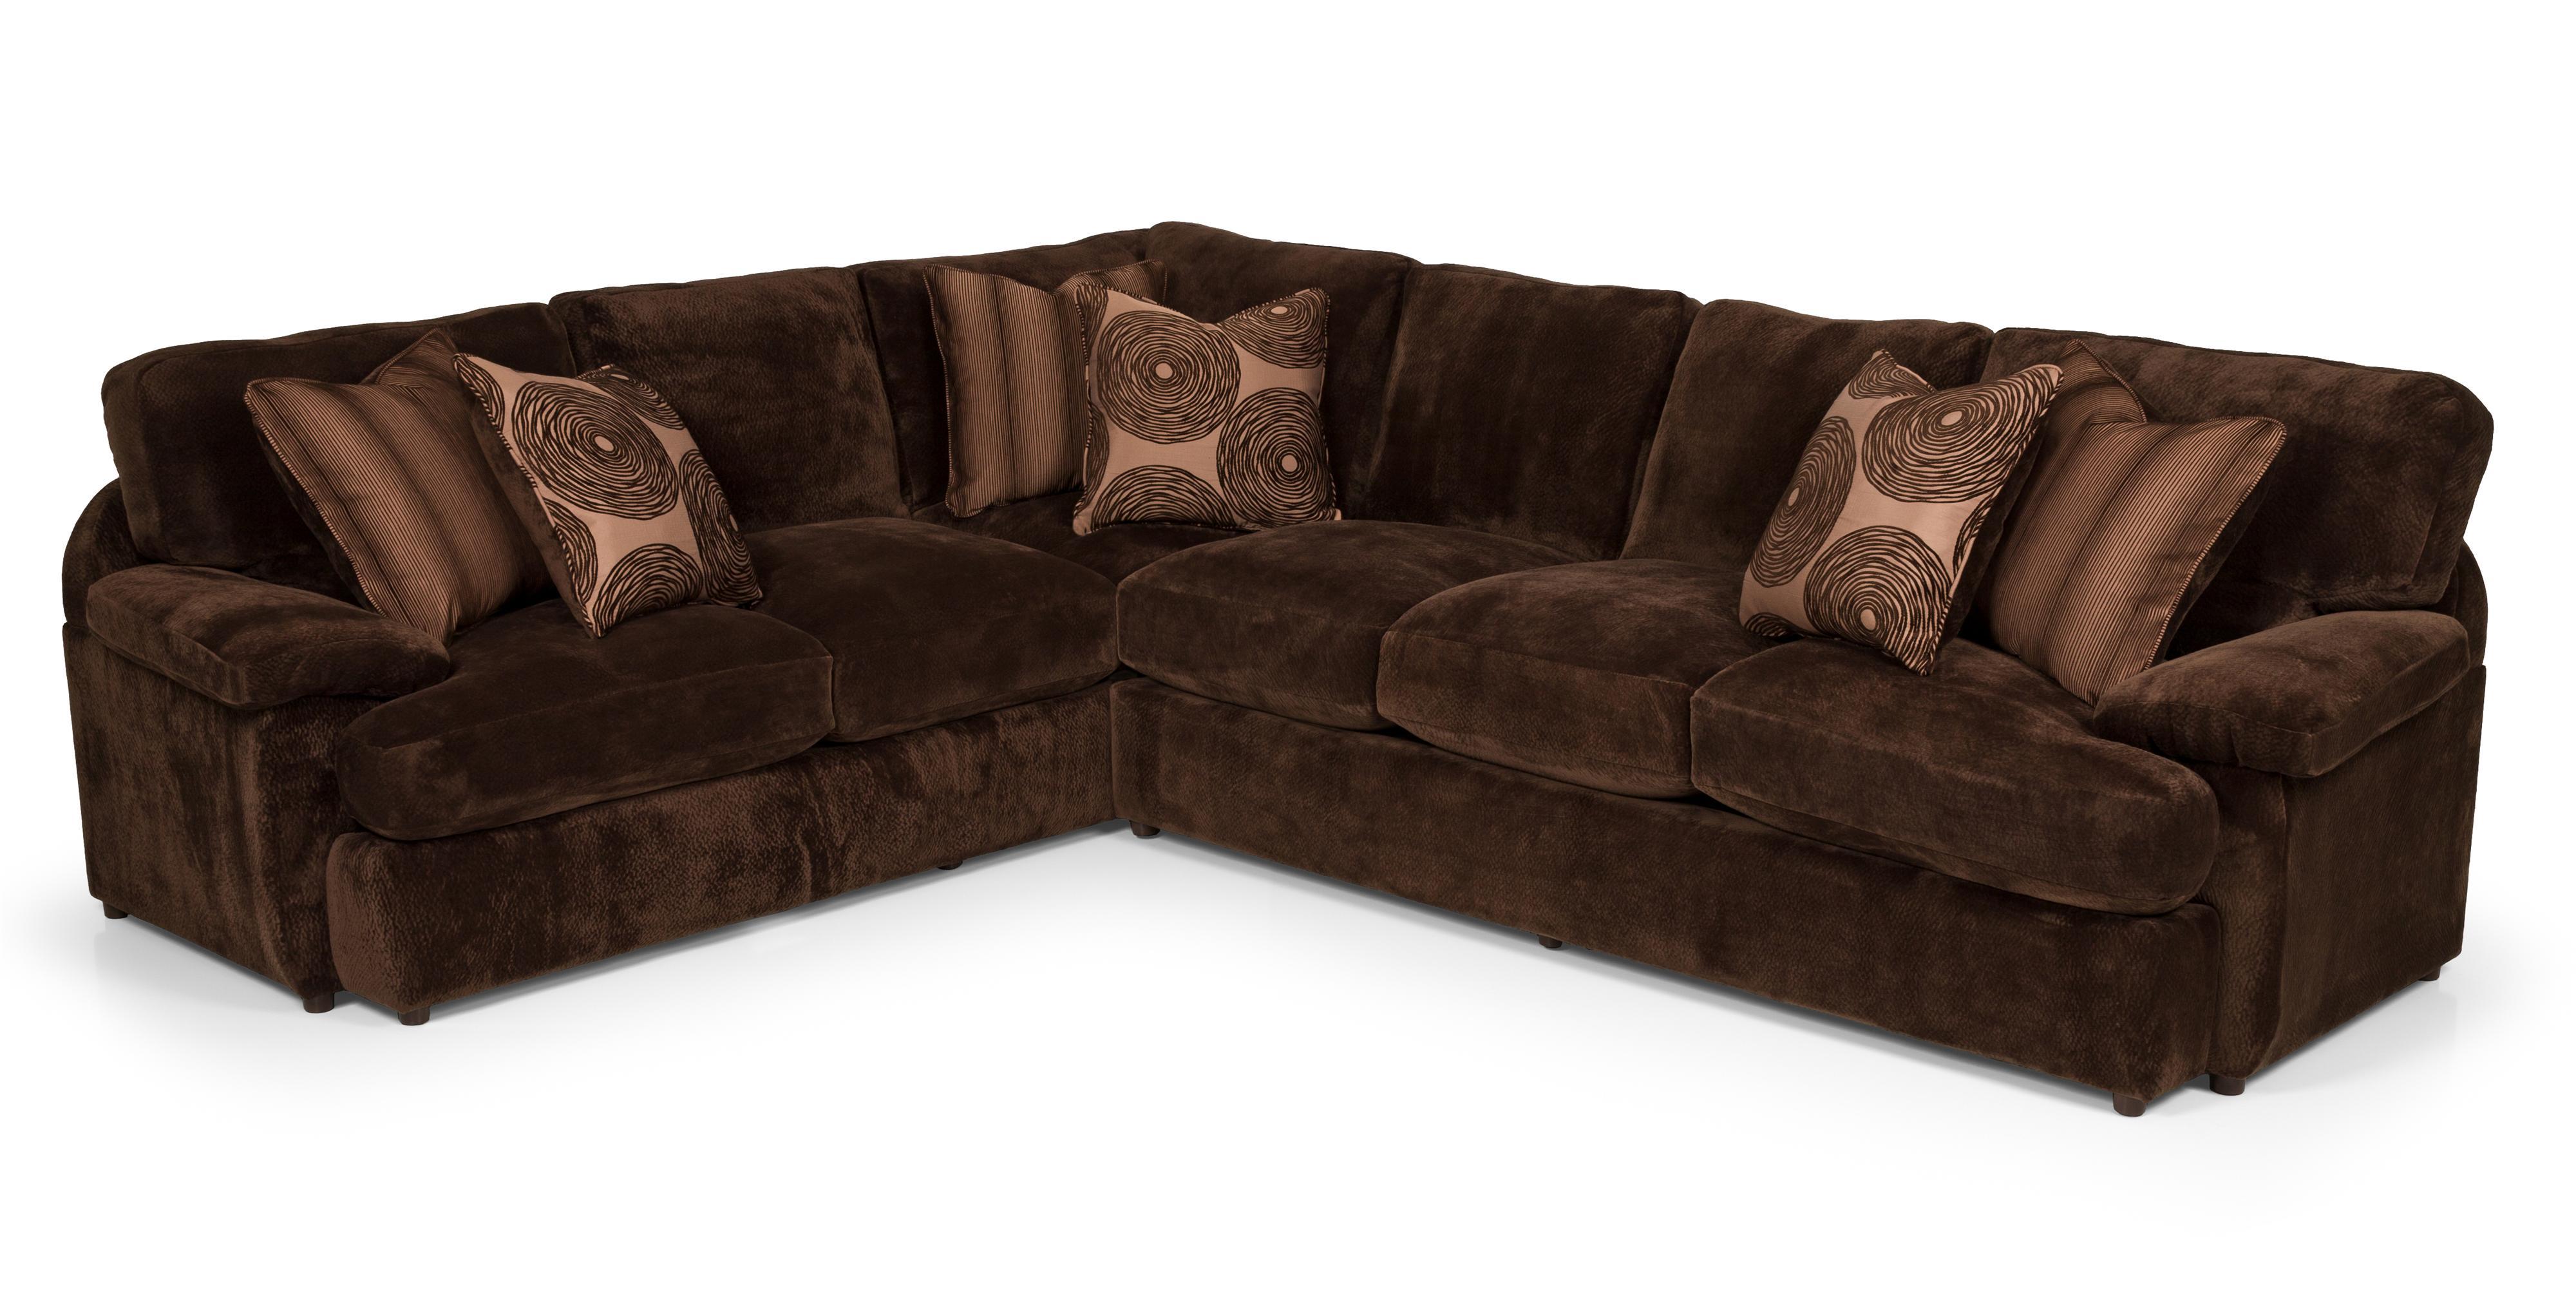 2 Pc Sectional Sofa w/ RAF Loveseat